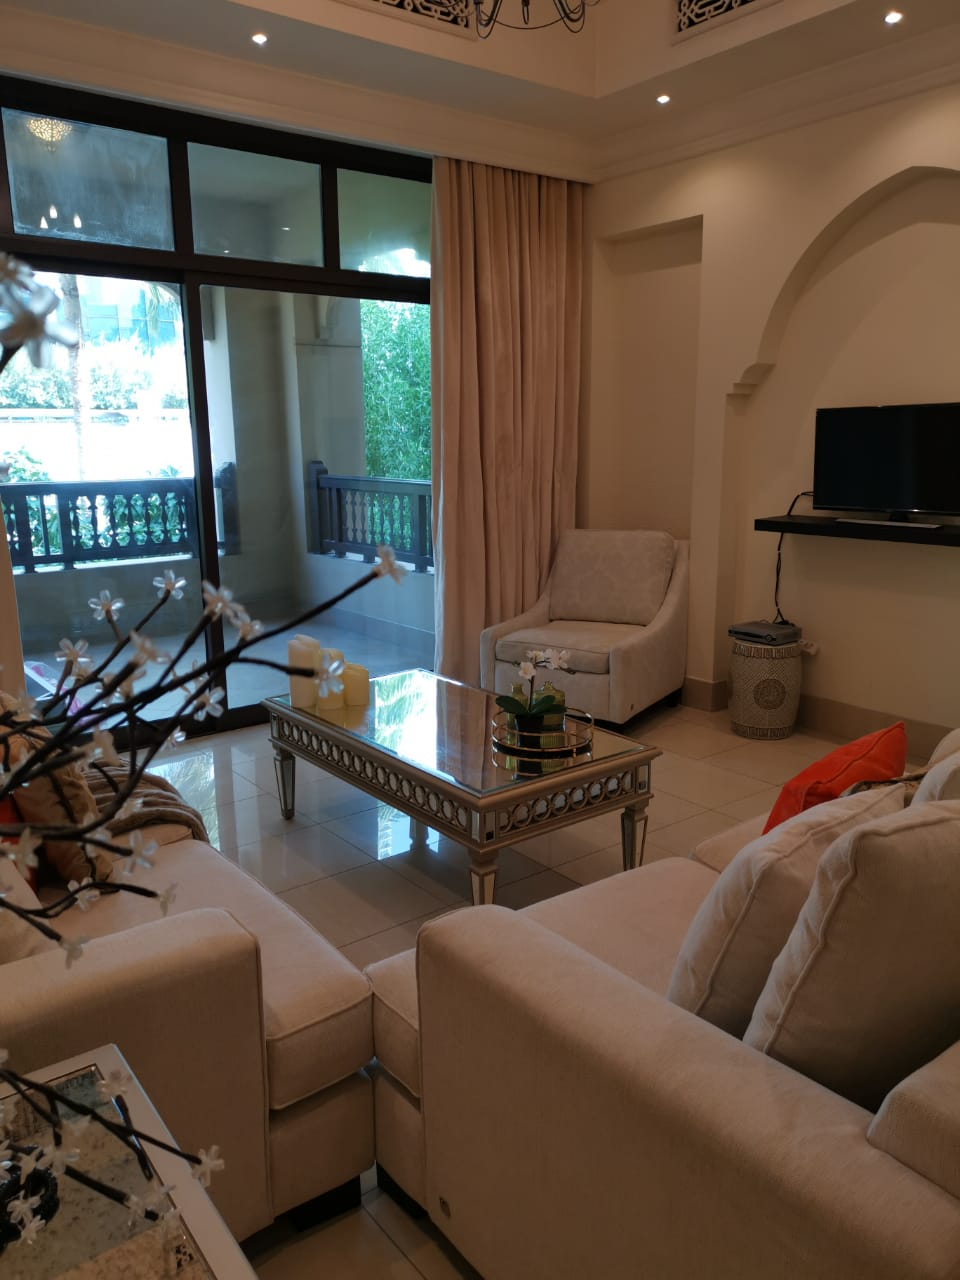 Apartment Wonderful stay in the heart of Dubai - SouK Al Bahar photo 27263151